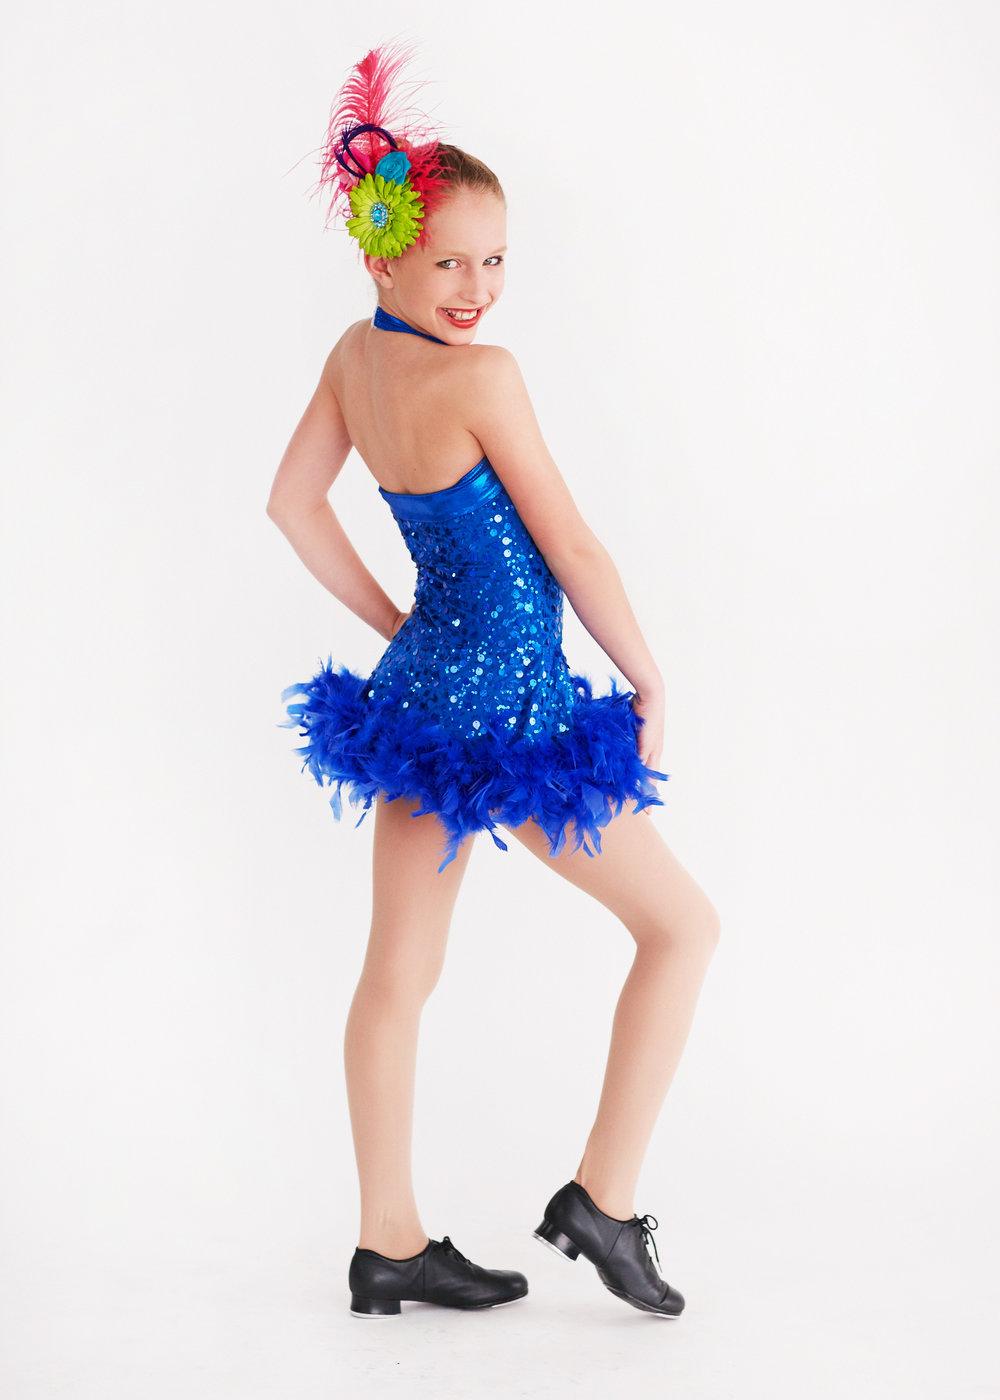 dance poses 002.jpg